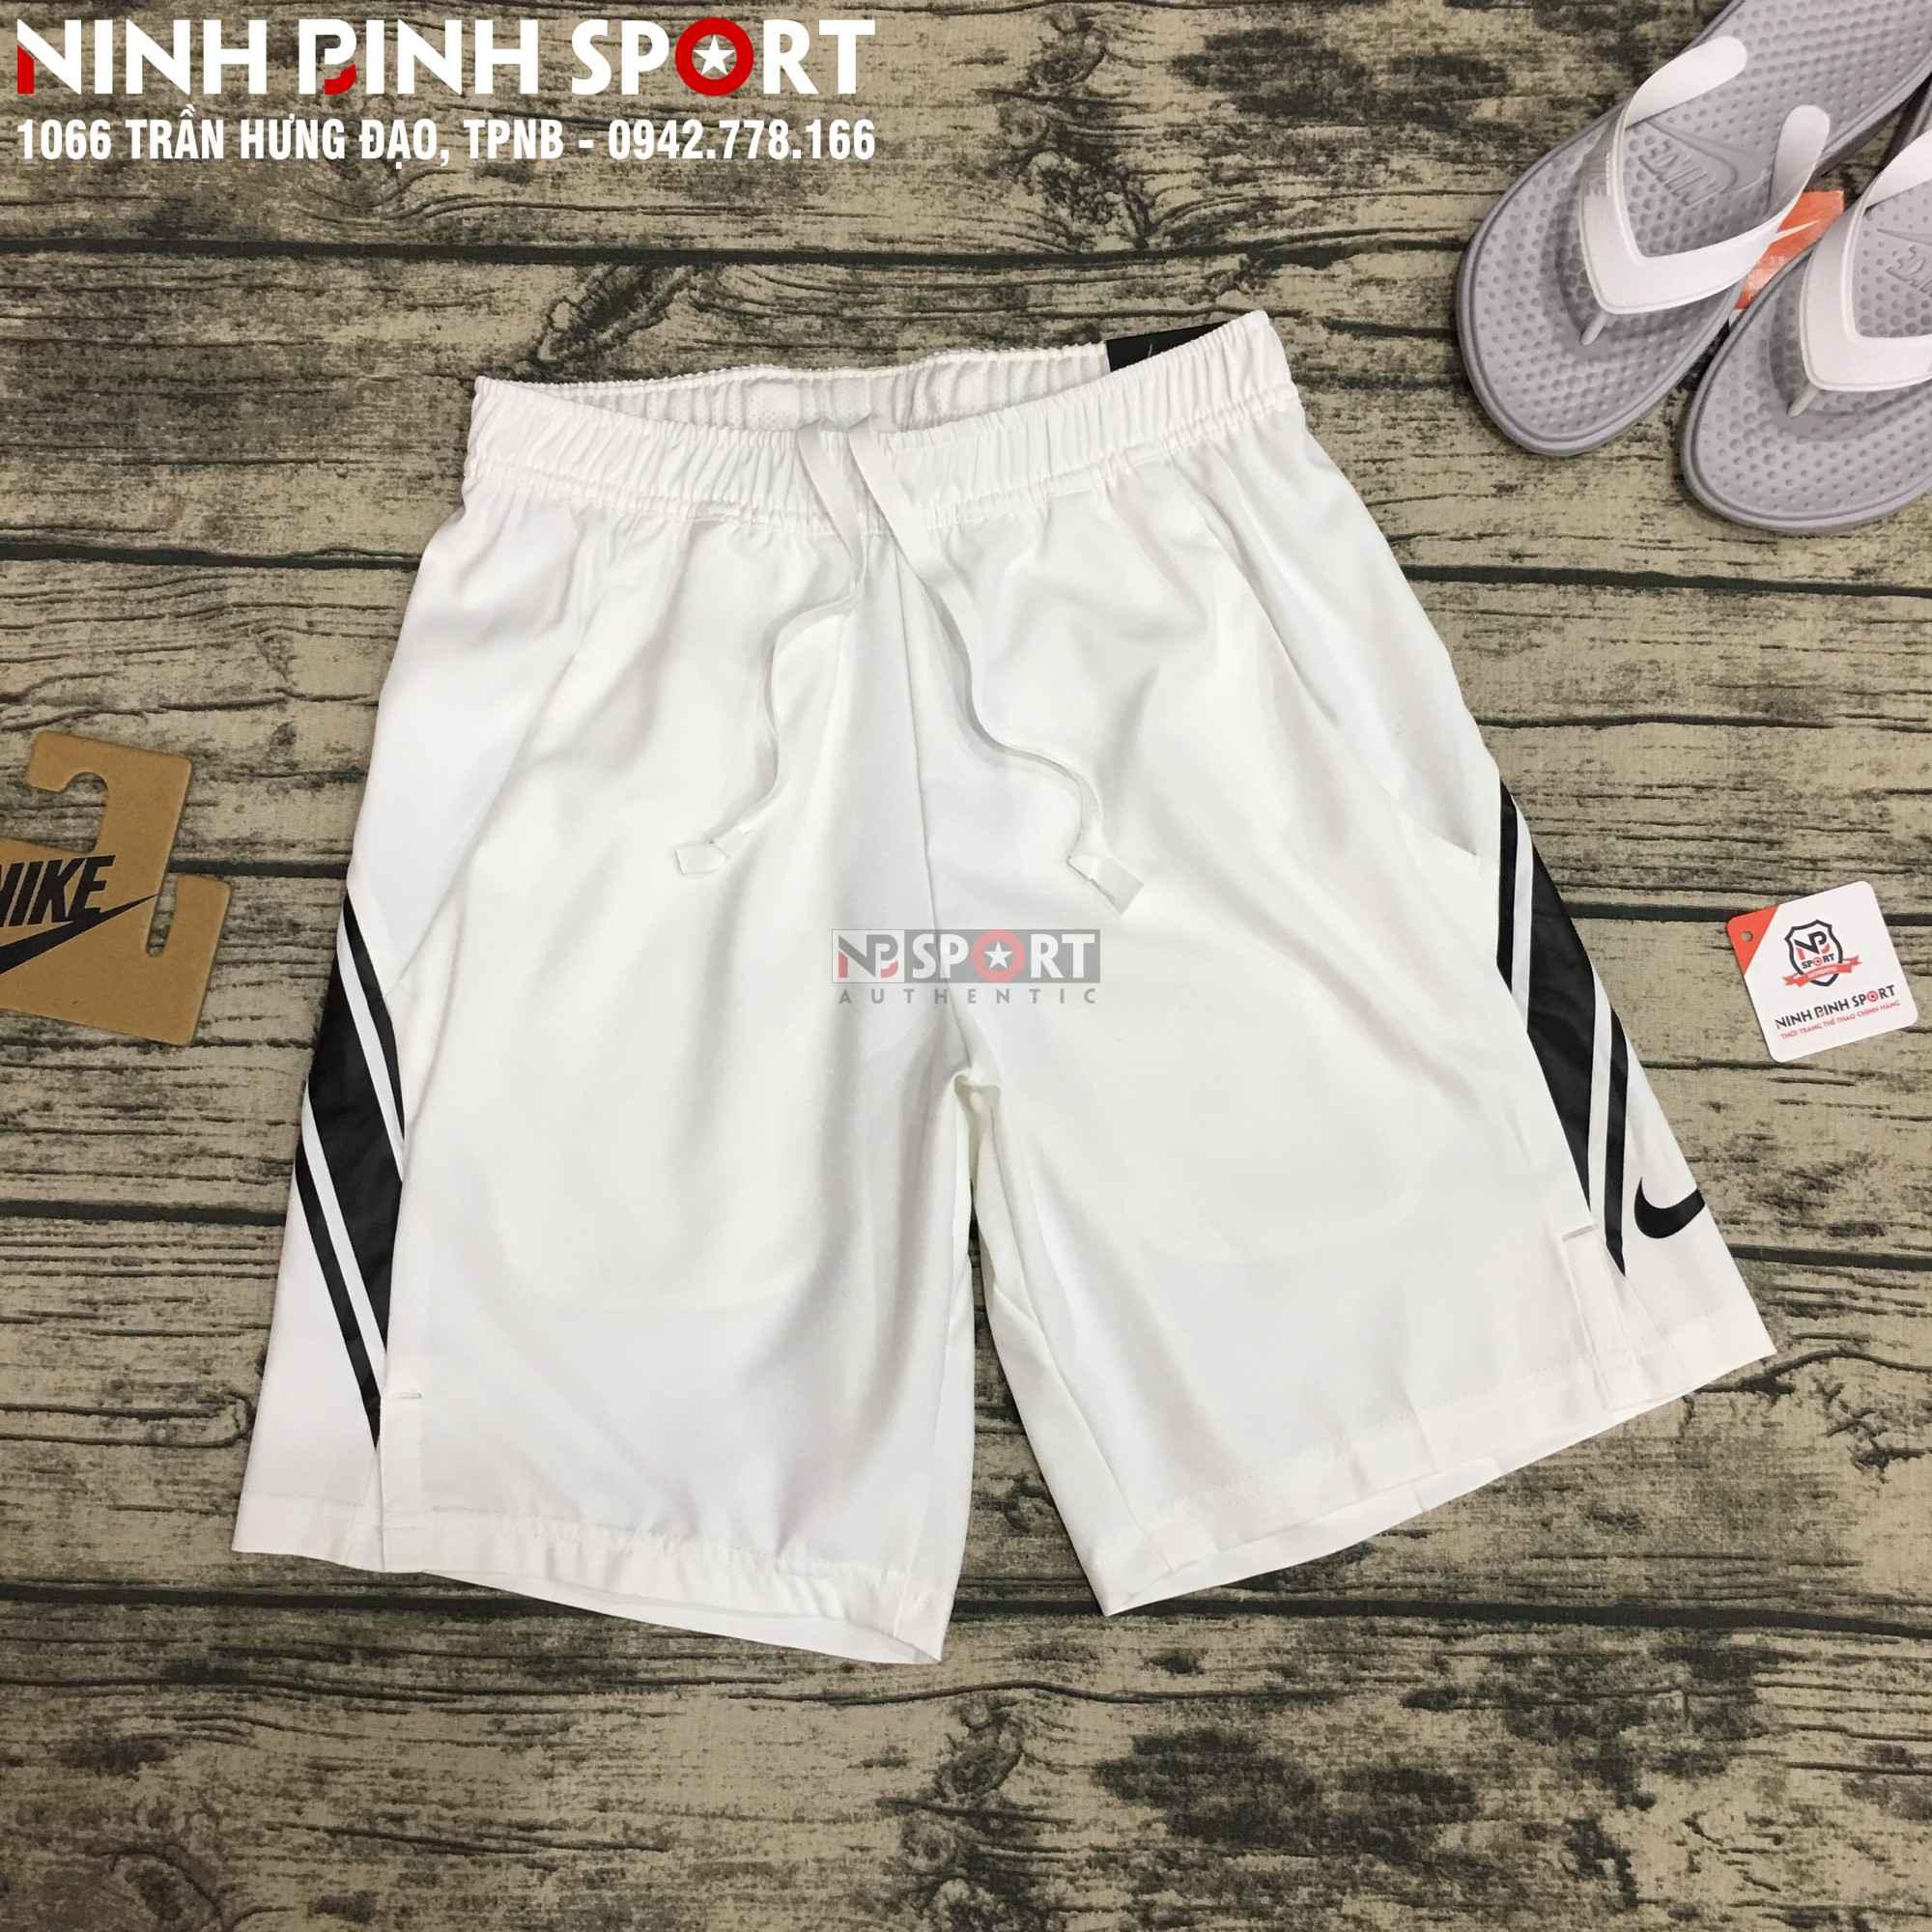 Quần thể thao nam Nike coat Dri-fit 9in 939266-101